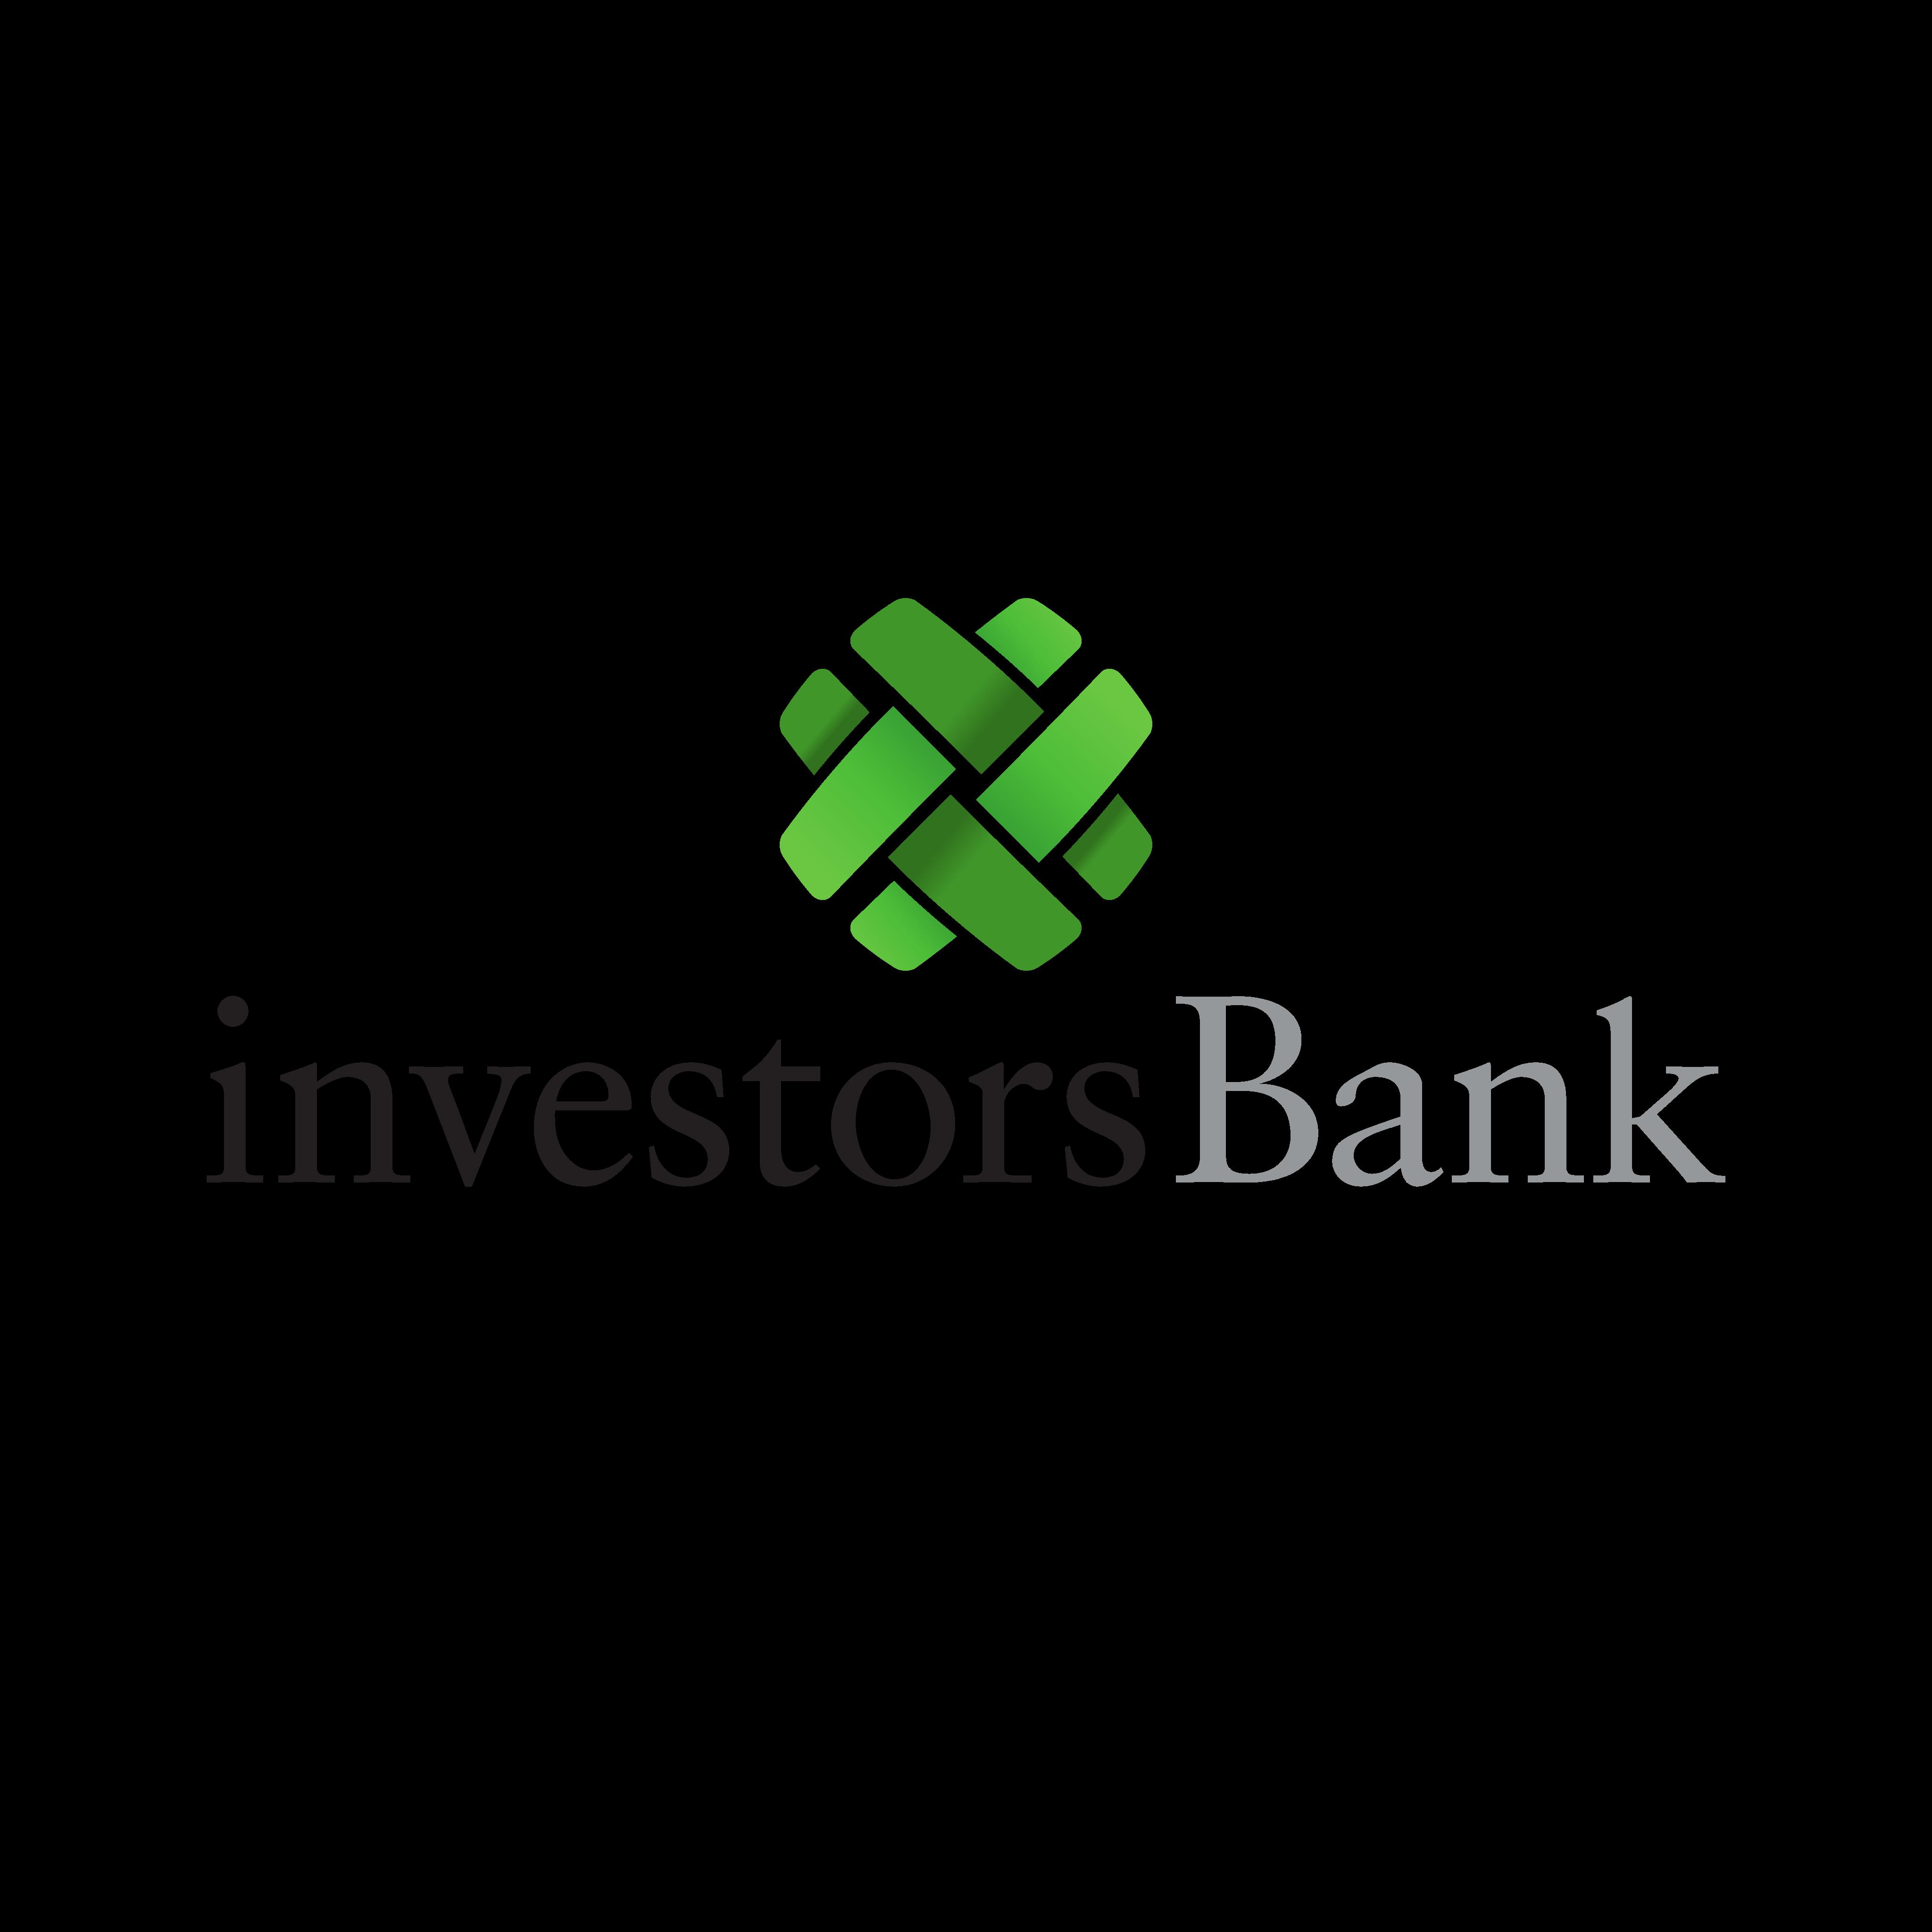 investors bank logo 0 - Investors Bank Logo